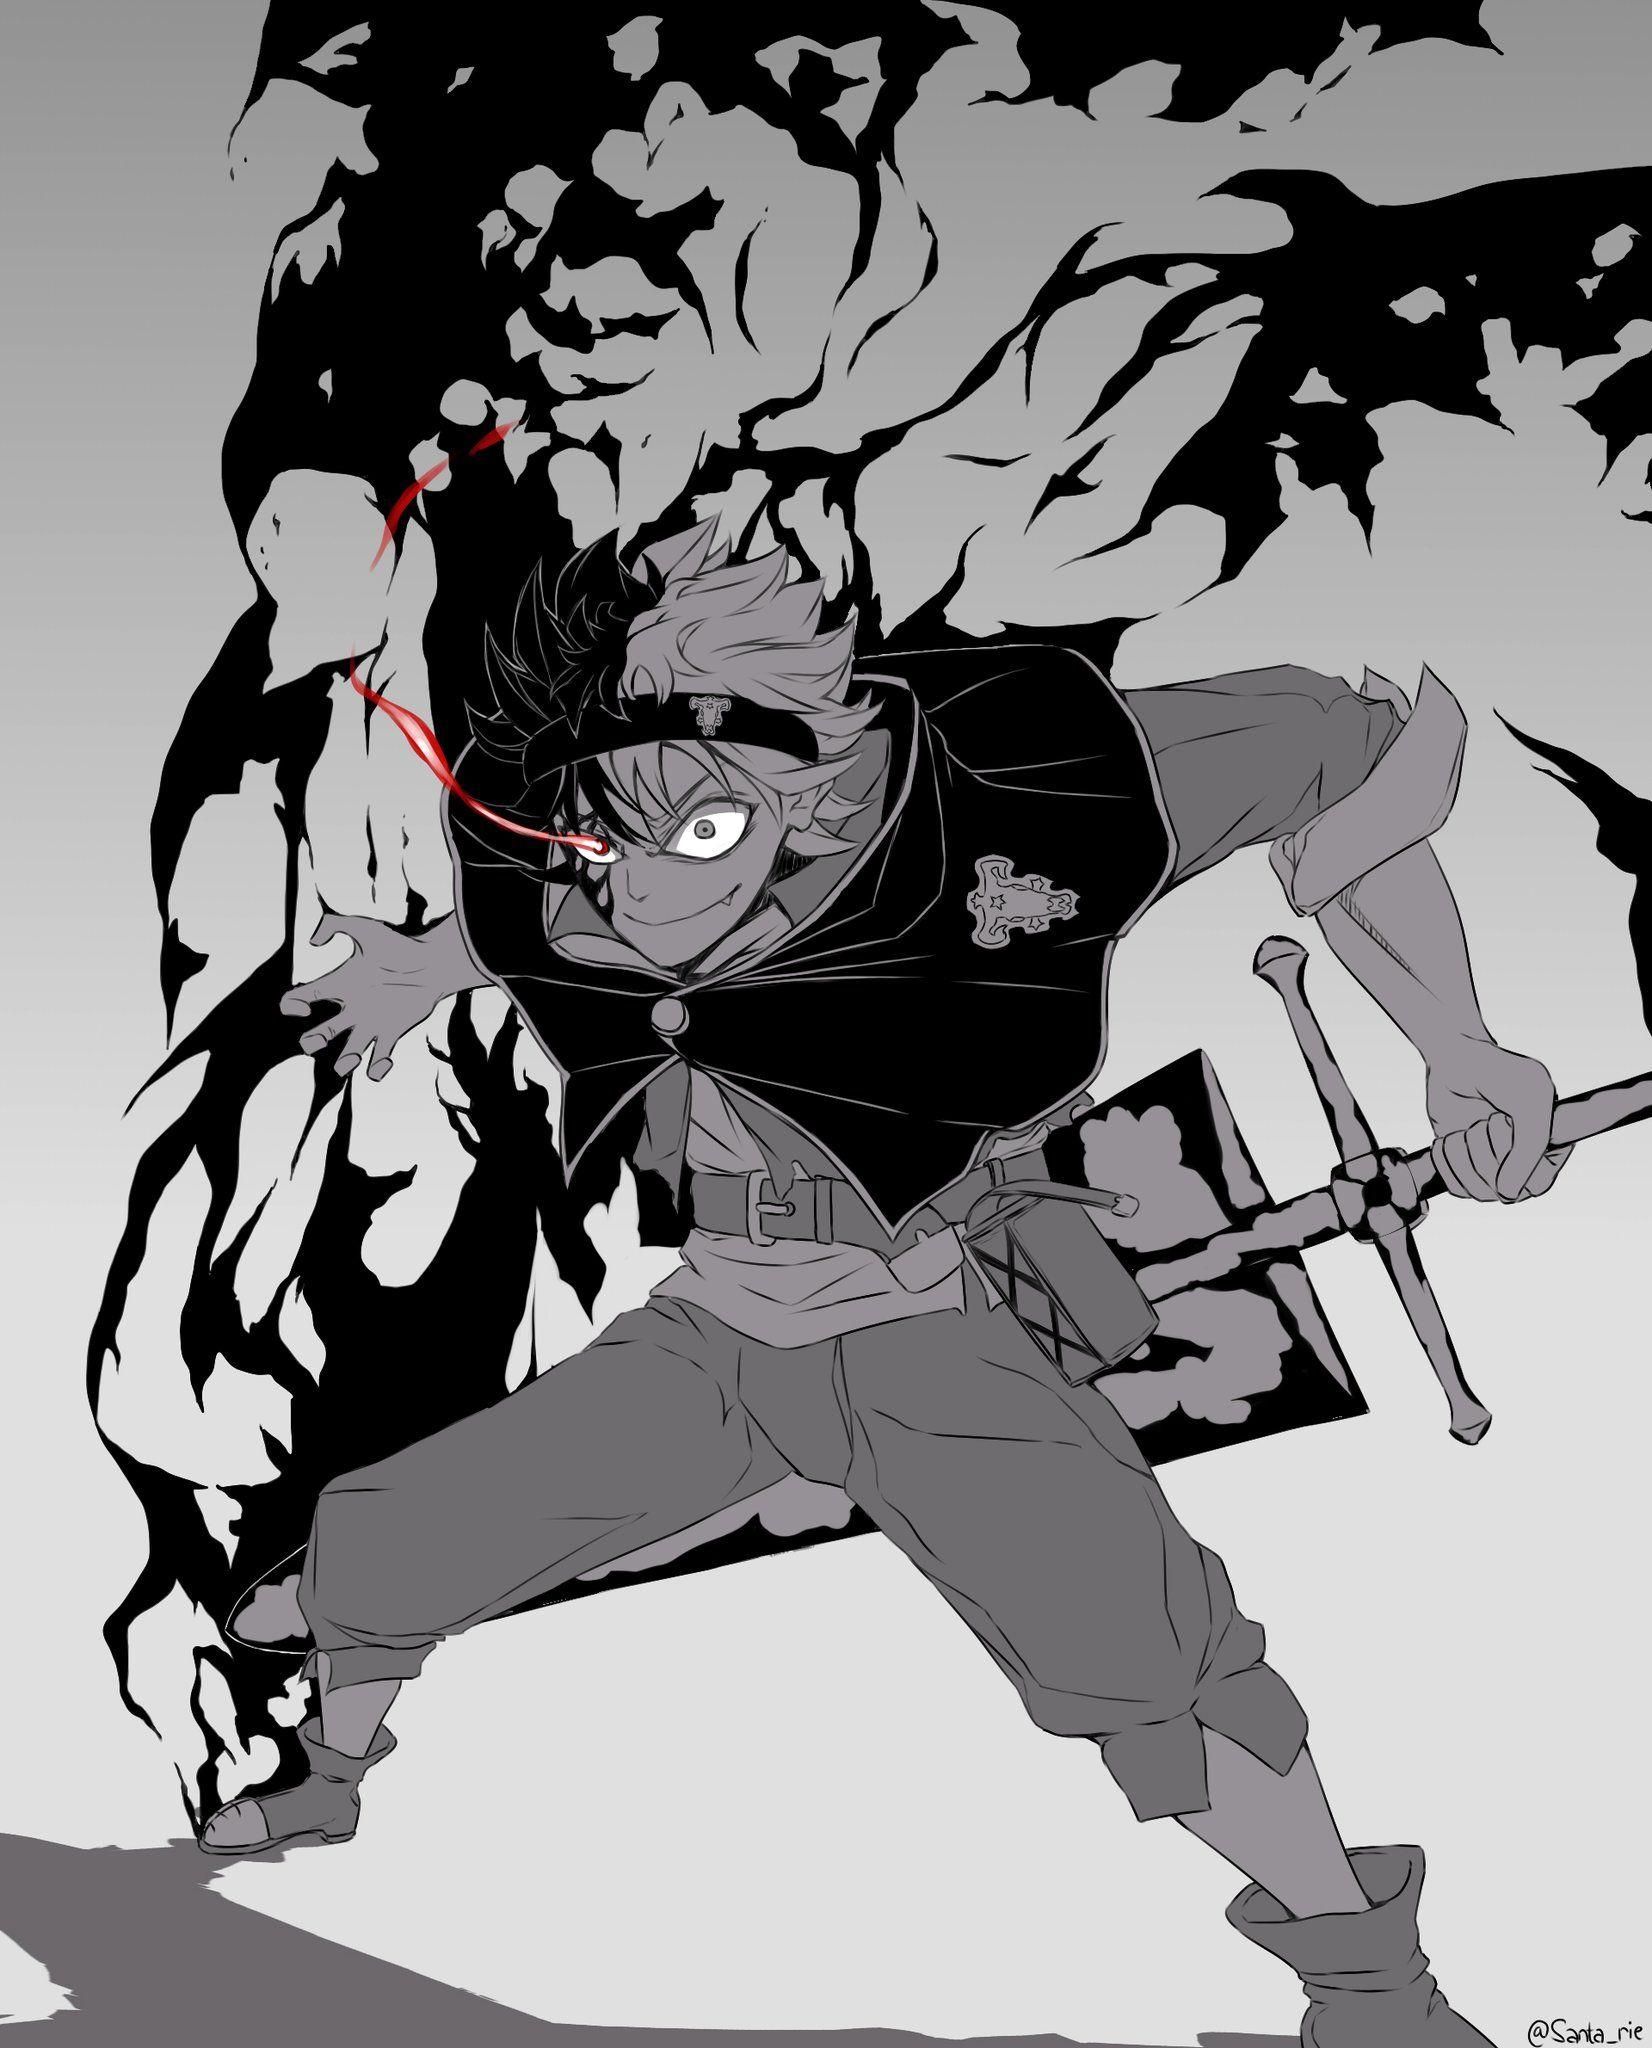 Asta Black Clover Black clover manga, Anime hd